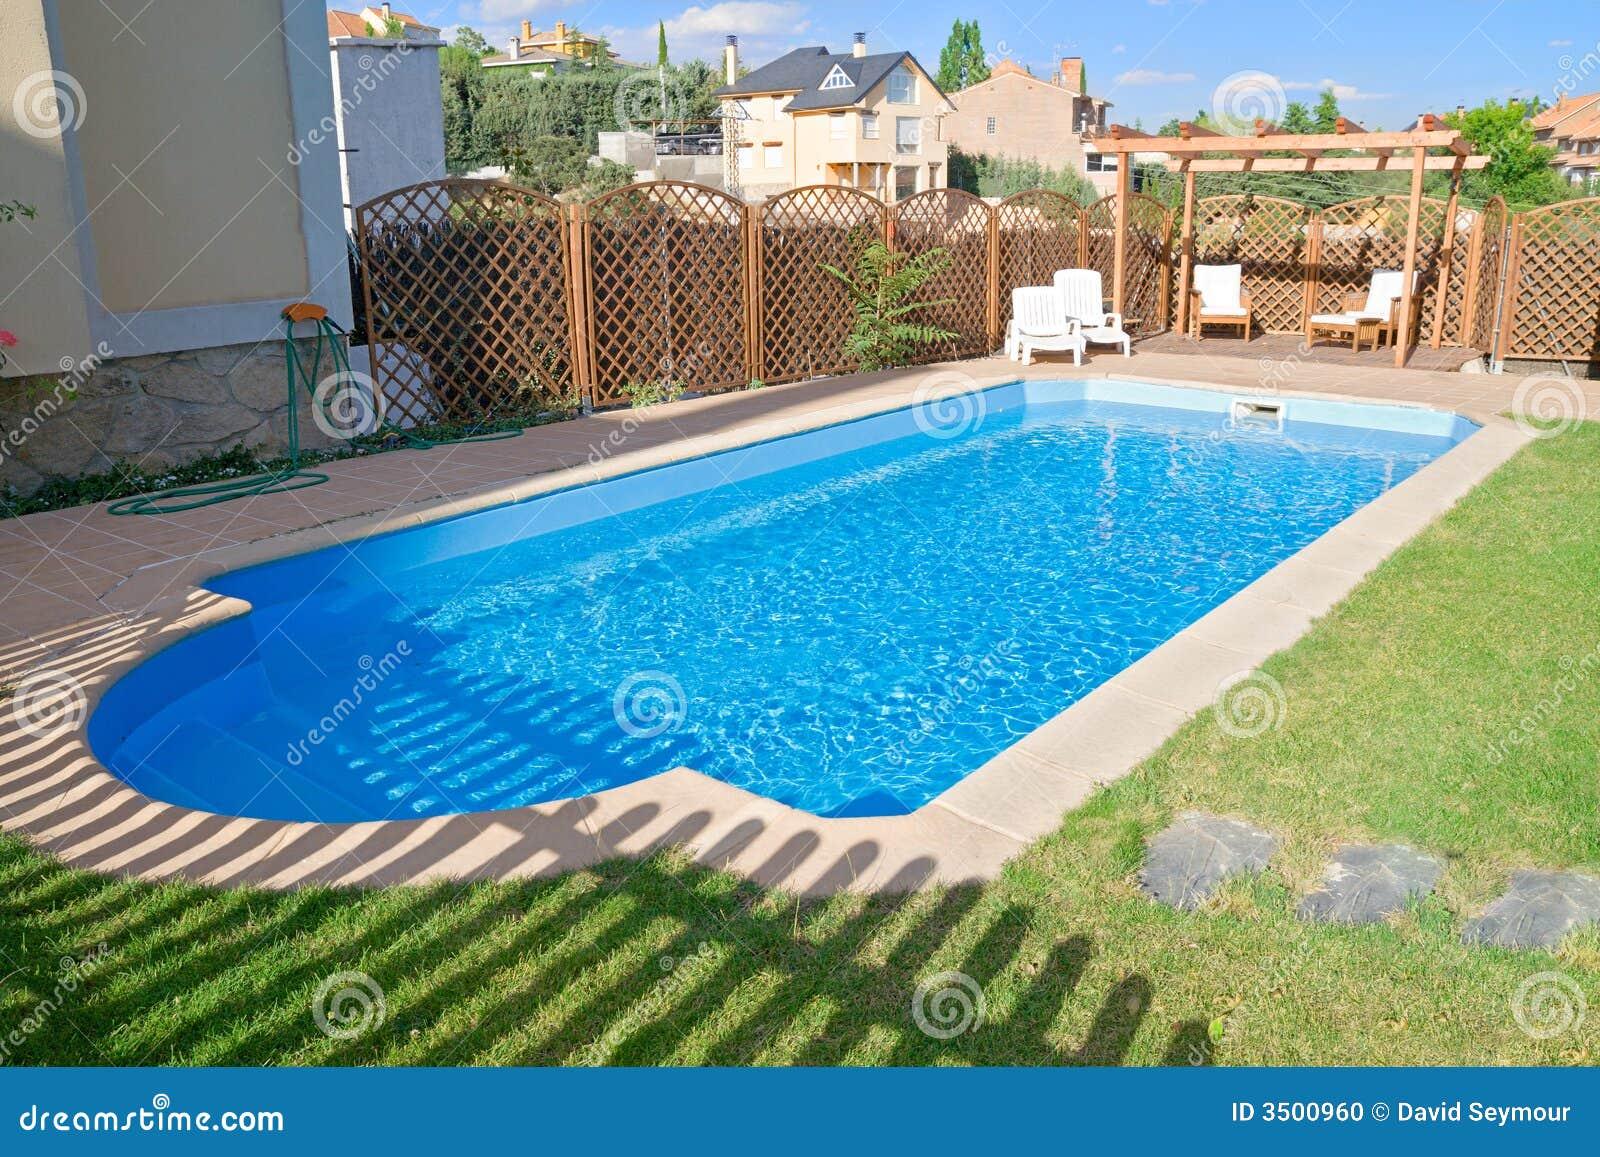 funkelndes frisches garten pool stockfoto bild 3500960. Black Bedroom Furniture Sets. Home Design Ideas